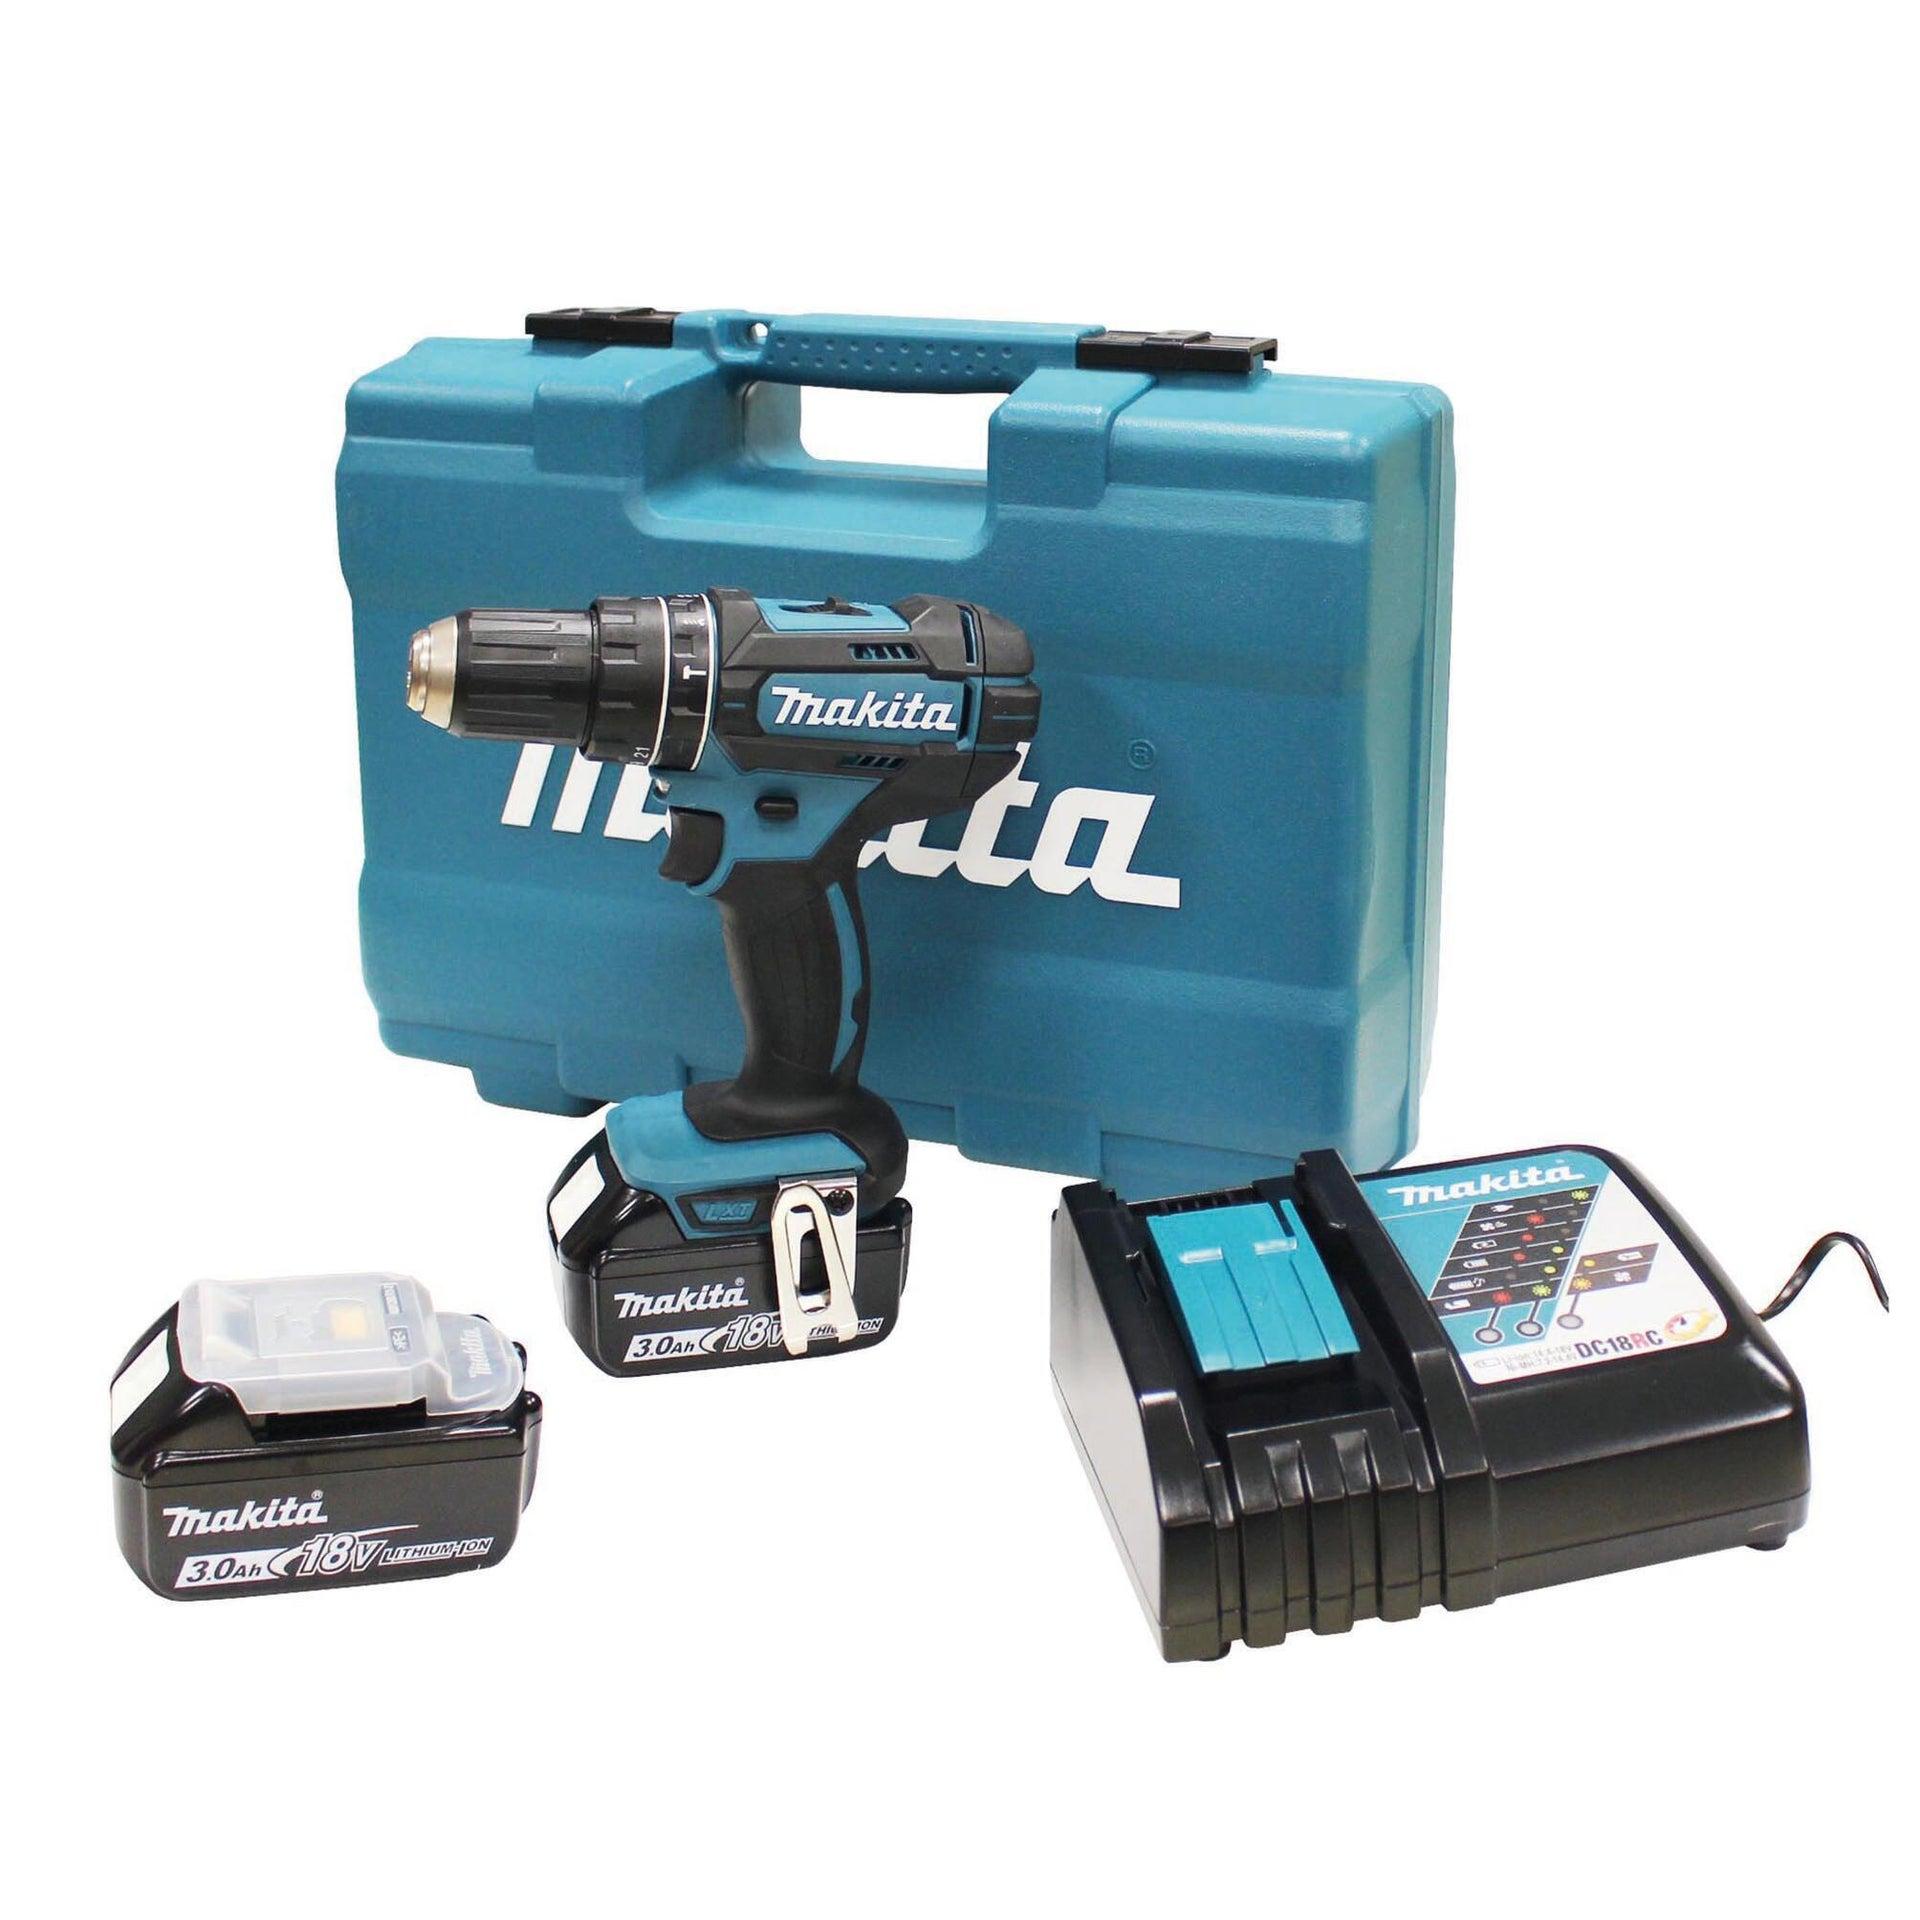 Trapano a percussione a batteria MAKITA DHP482RFX1 18 V, 3 Ah, 2 batterie - 1